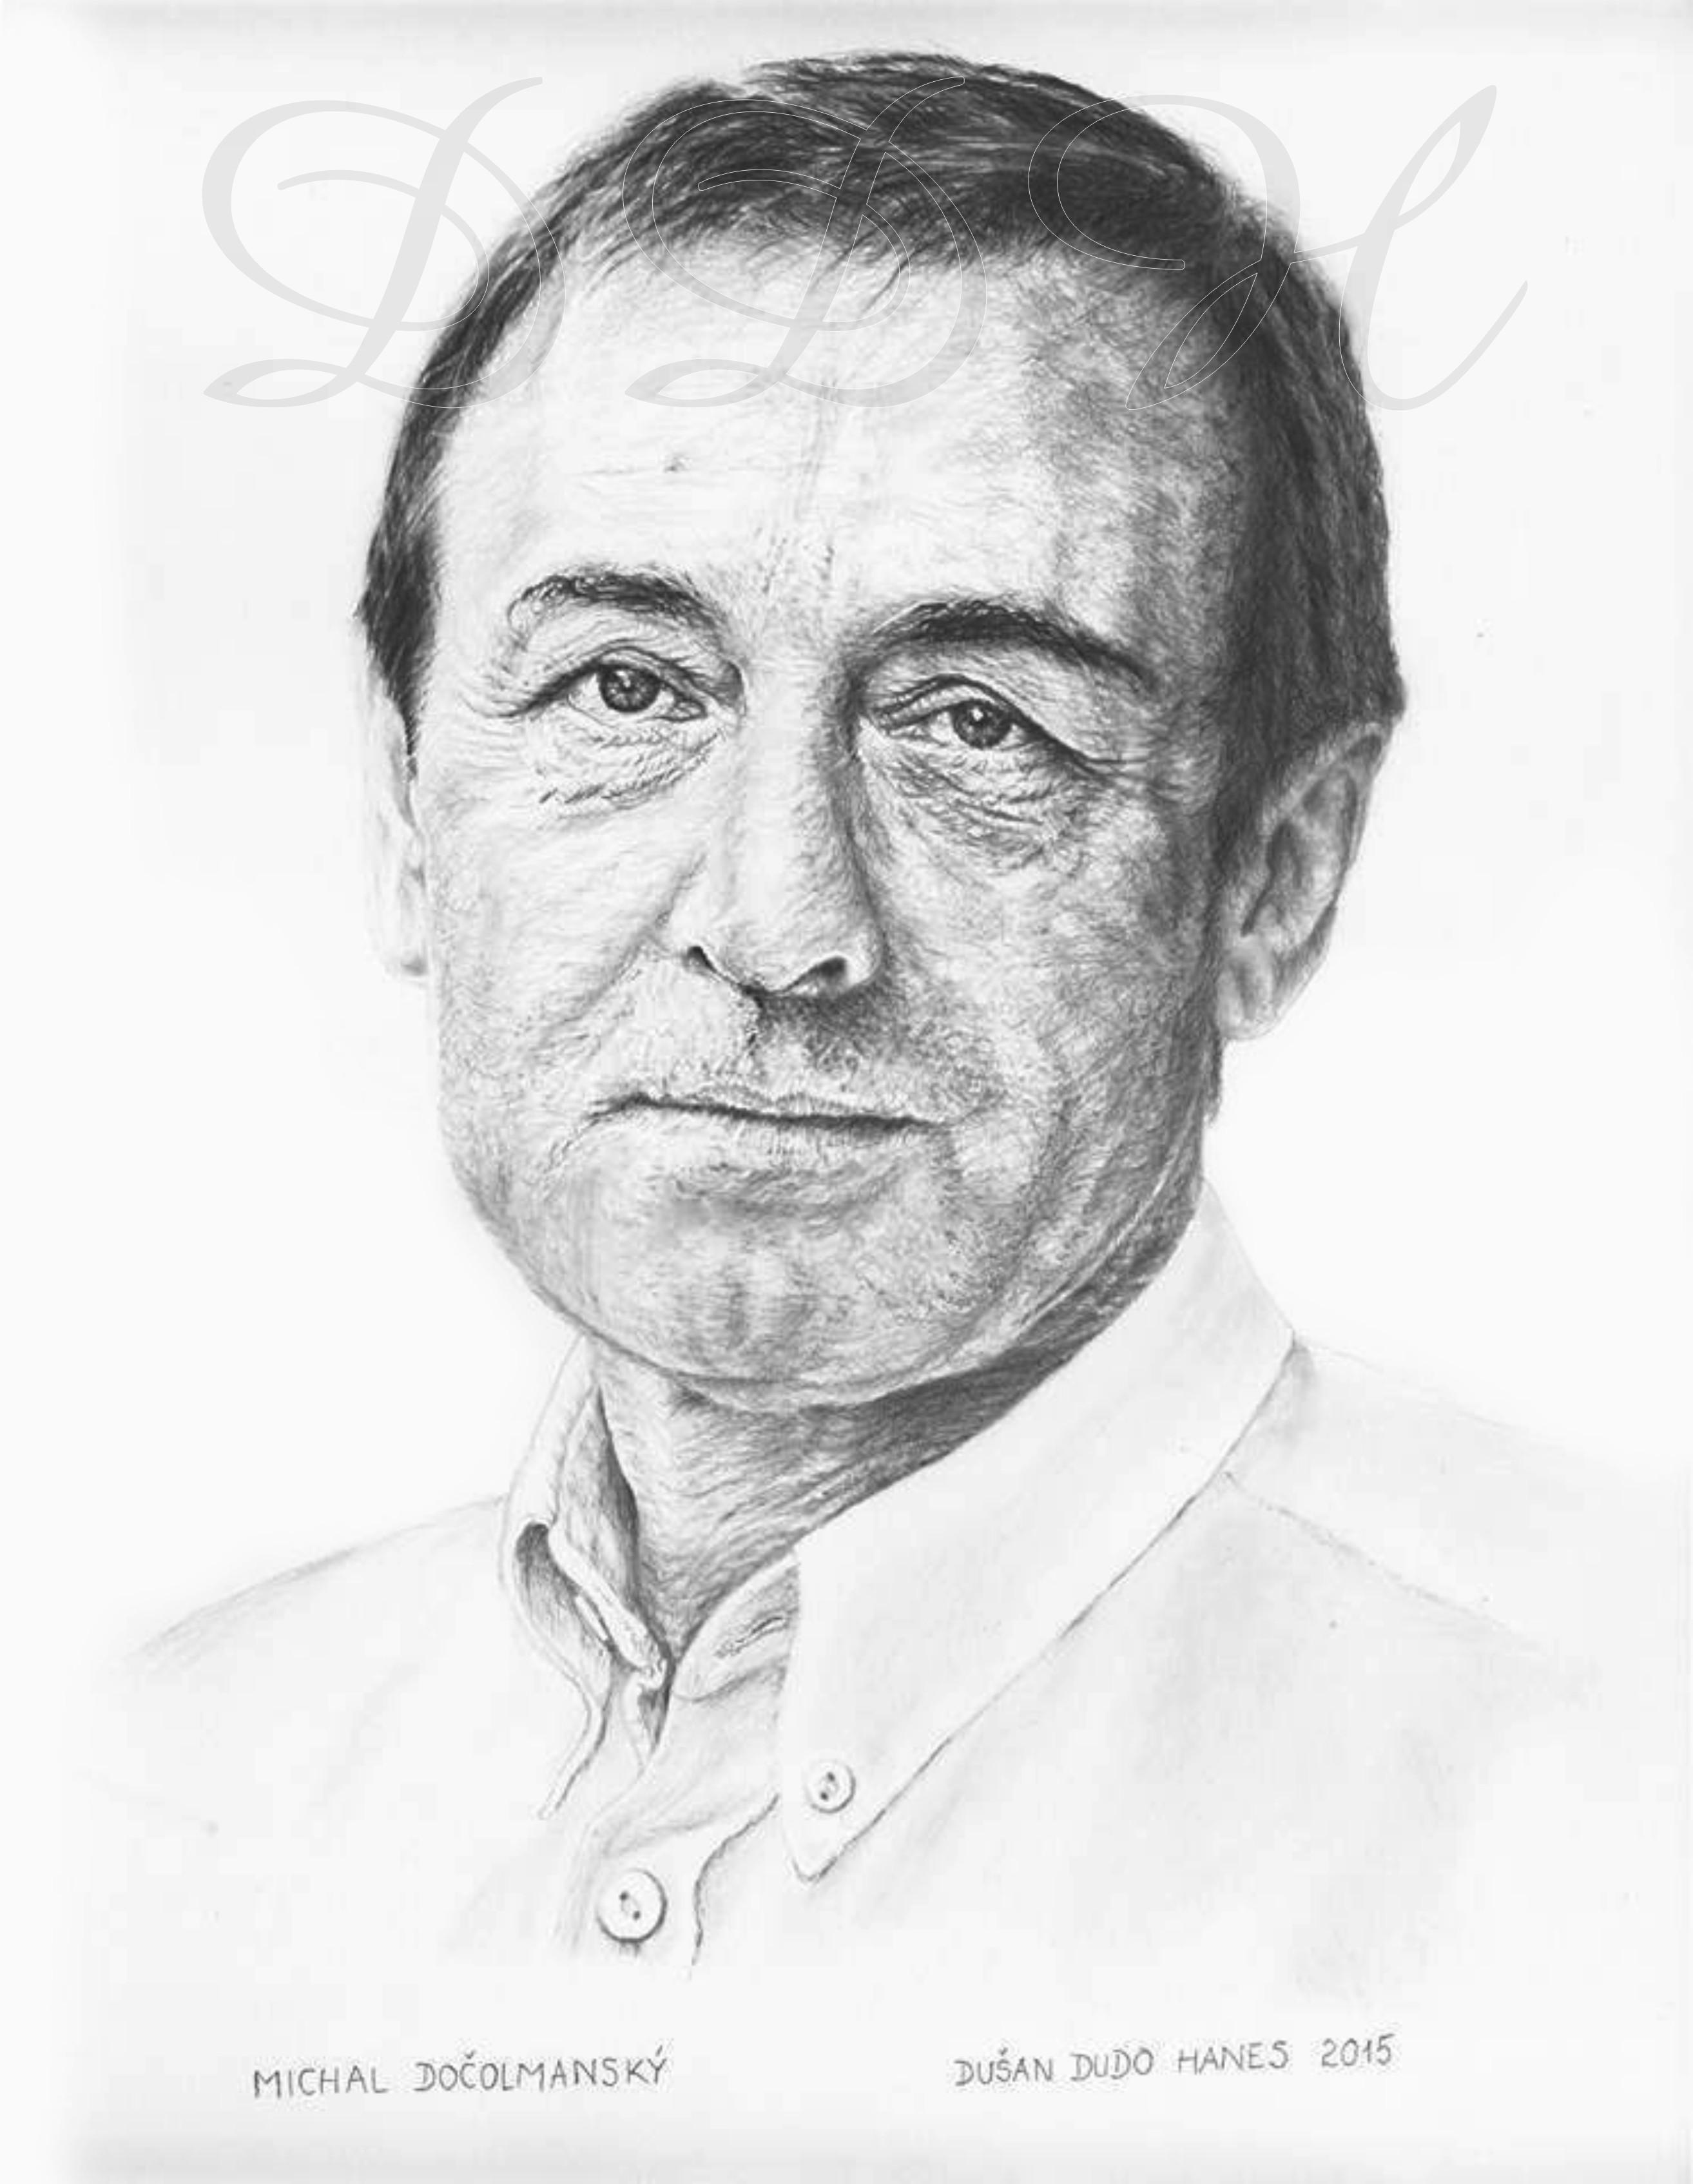 128 - Michal Dočolmanský, portrét Dušan Dudo Hanes